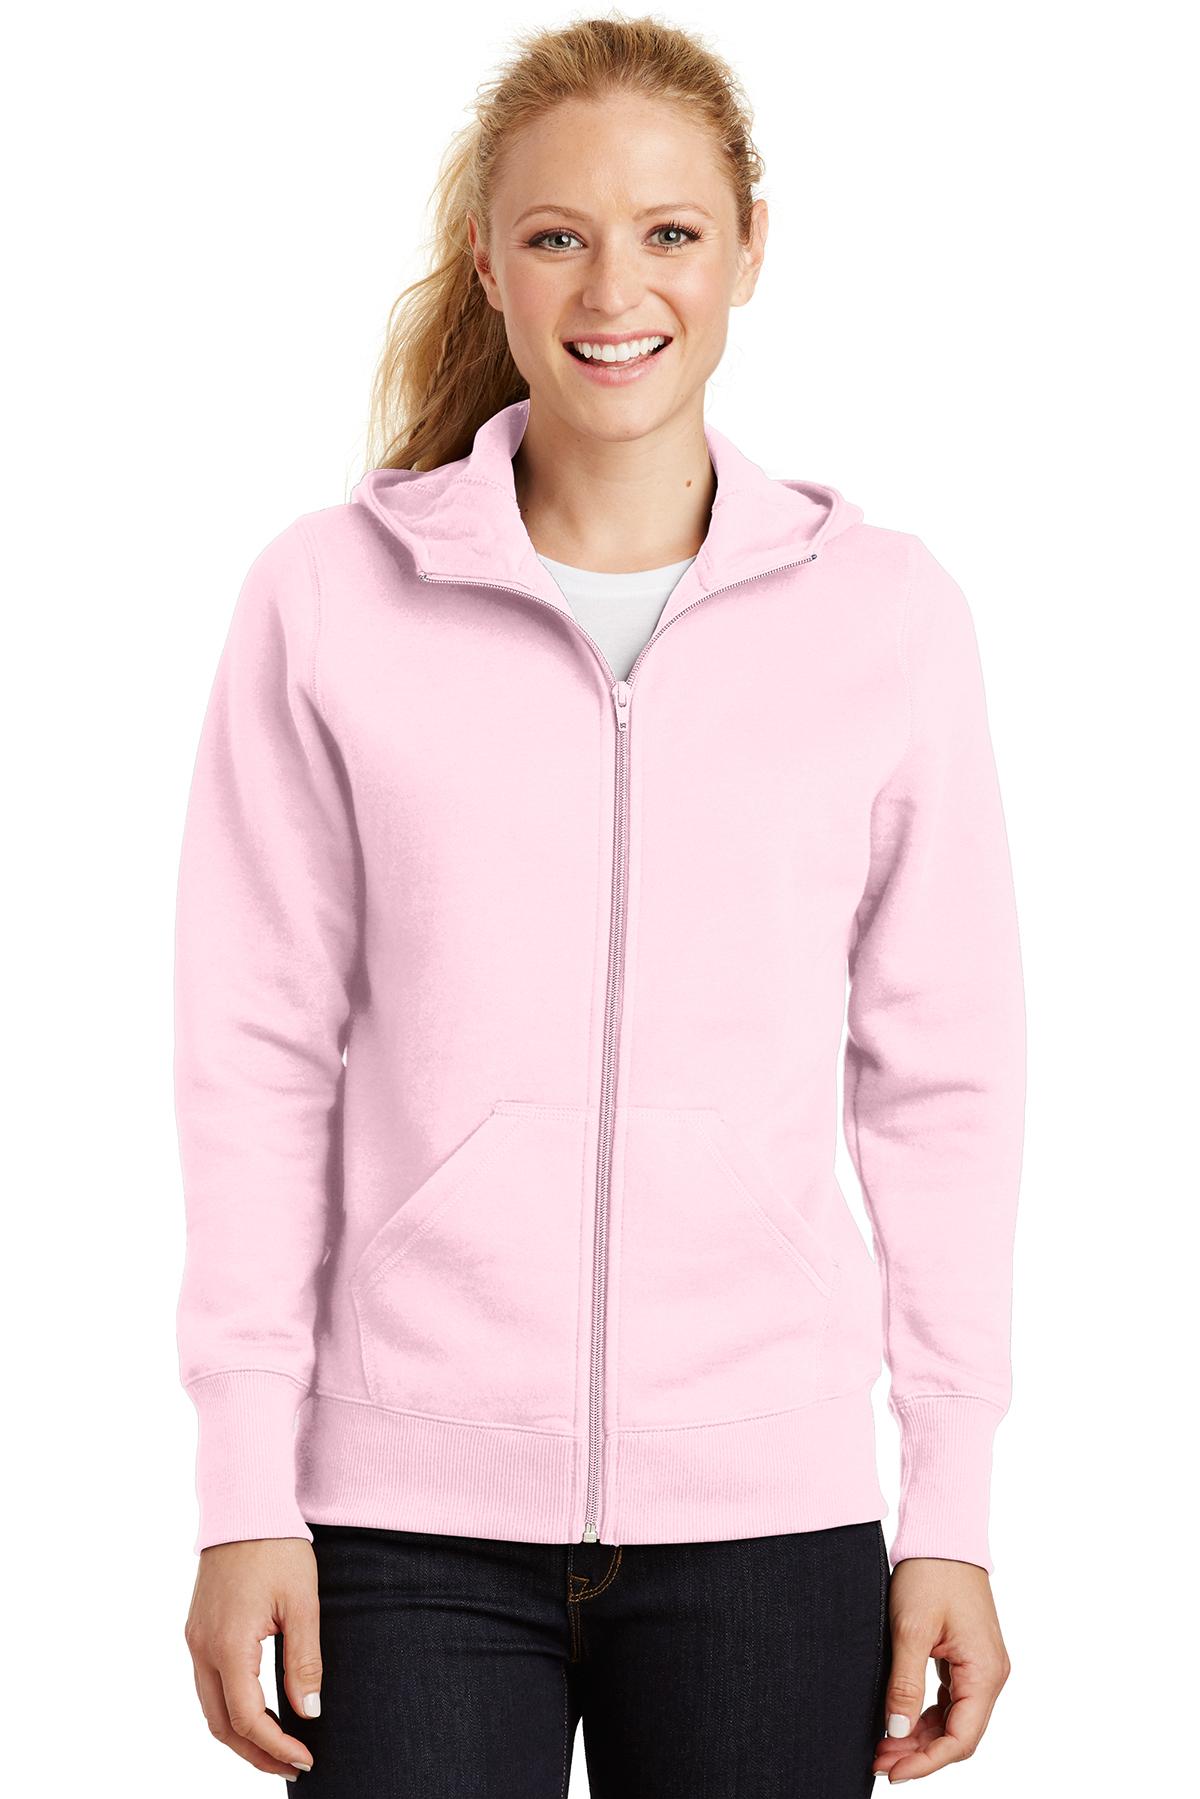 XS Sport-Tek L265 Ladies Full-Zip Hooded Fleece Jacket White